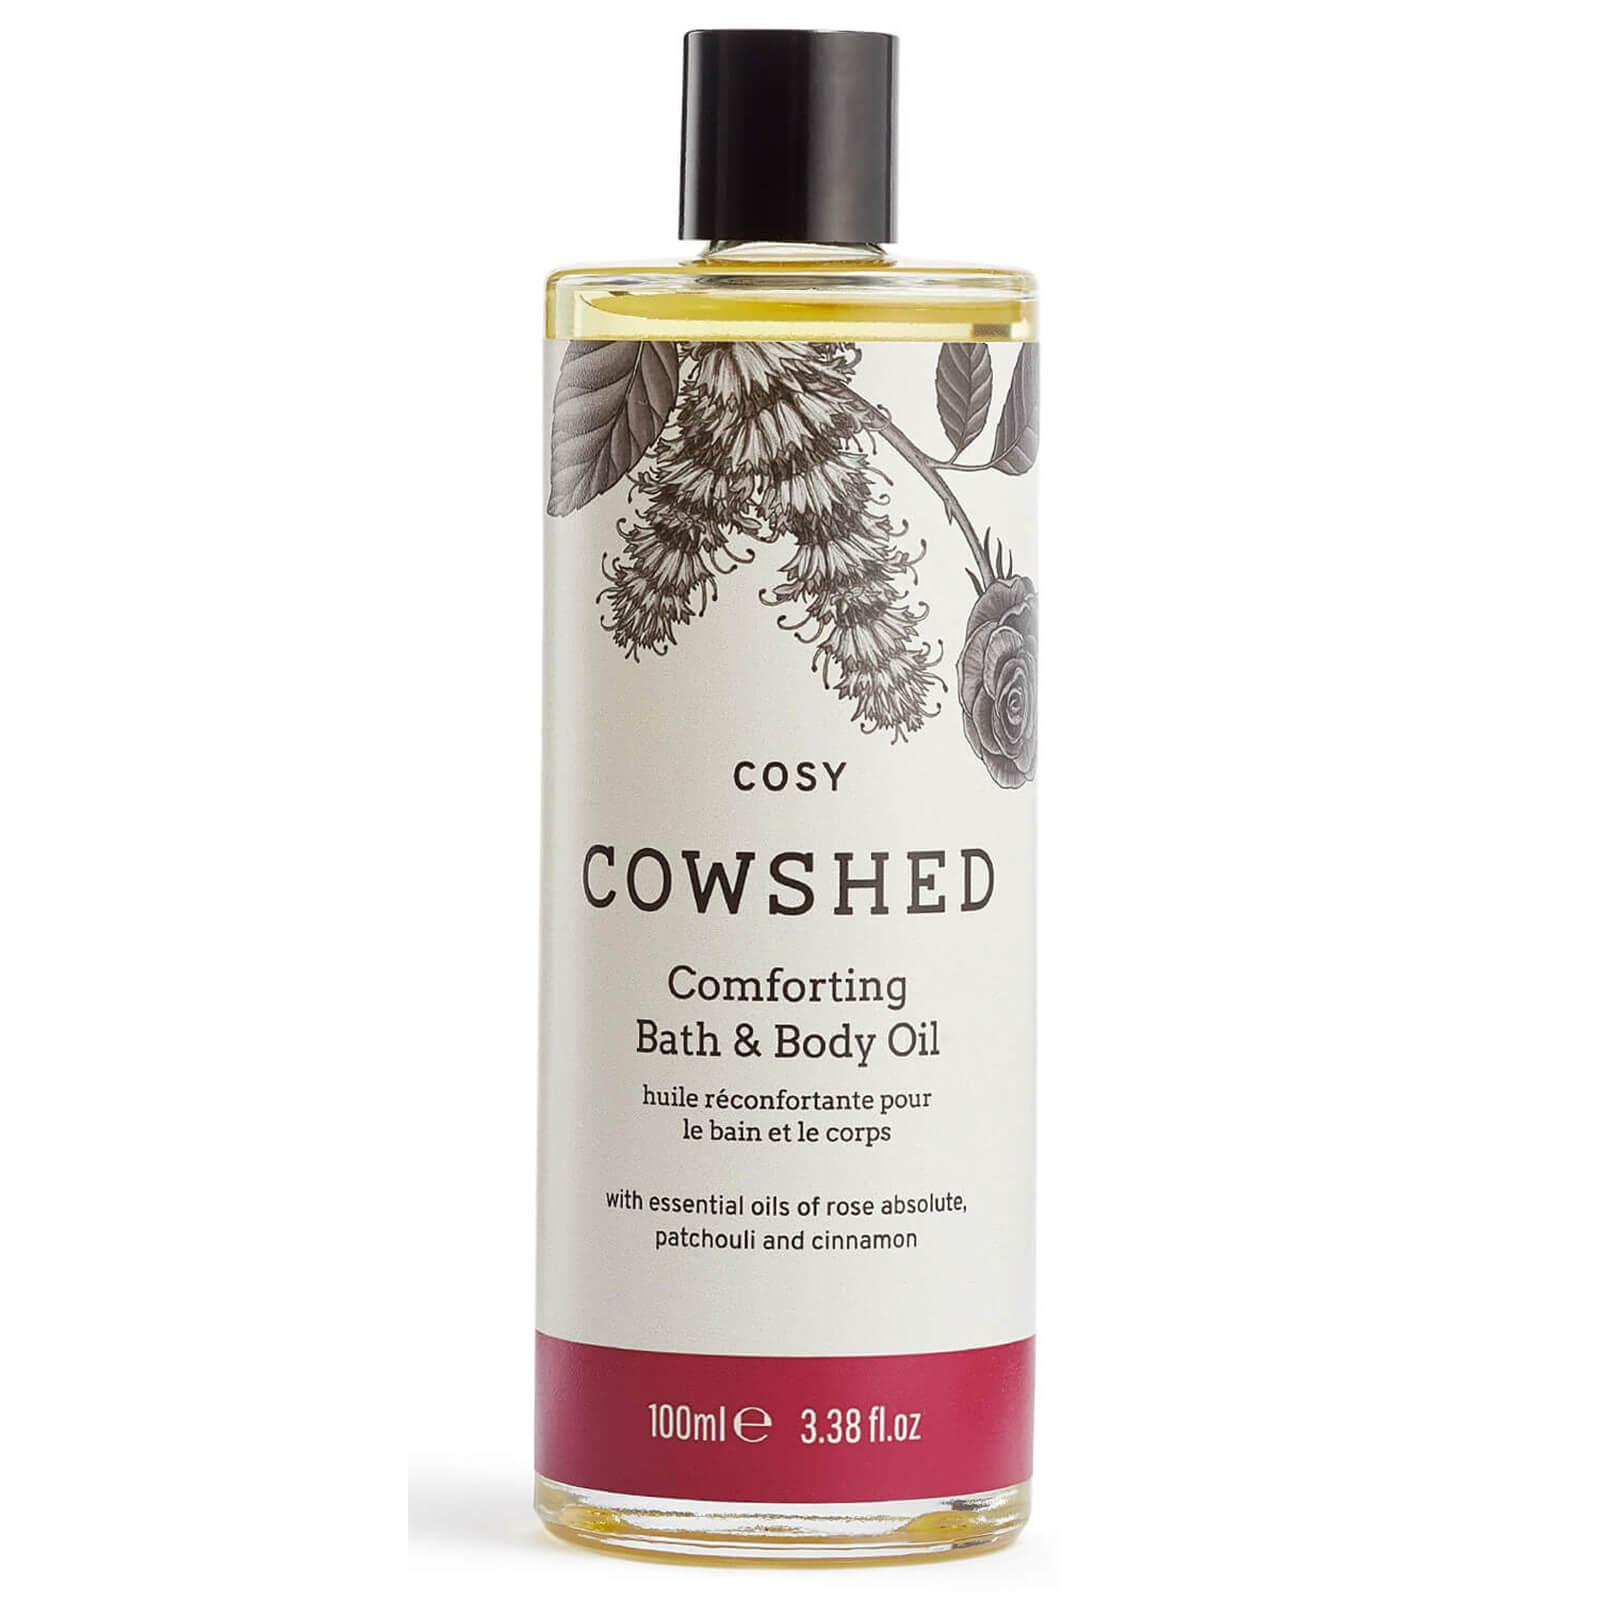 Купить Cowshed COSY Comforting Bath & Body Oil 100ml